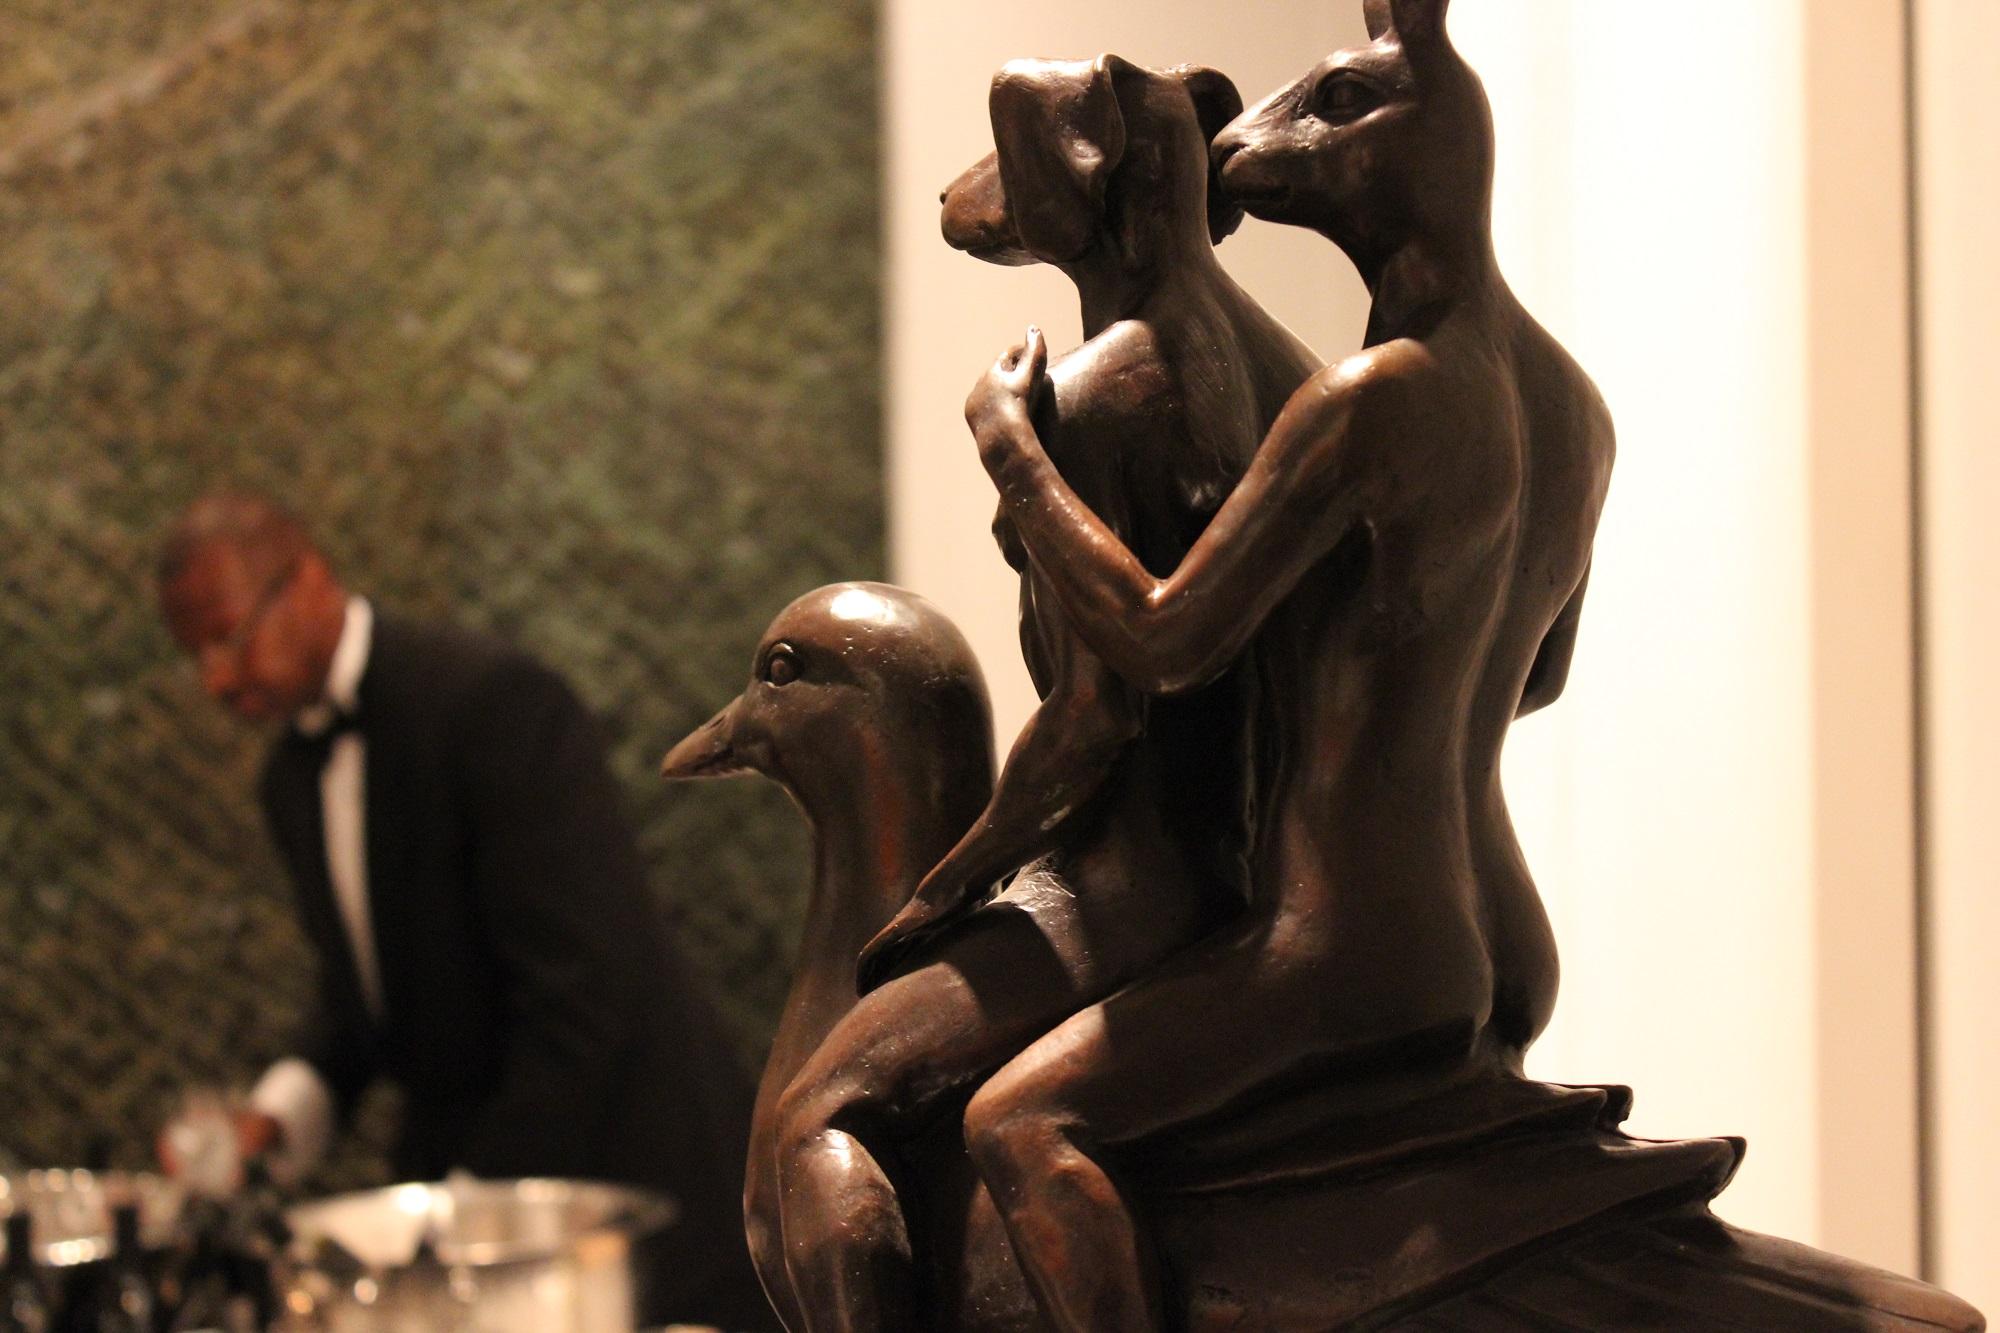 Frank Schroeder Bill Lowe Gallery Opening 35.JPG